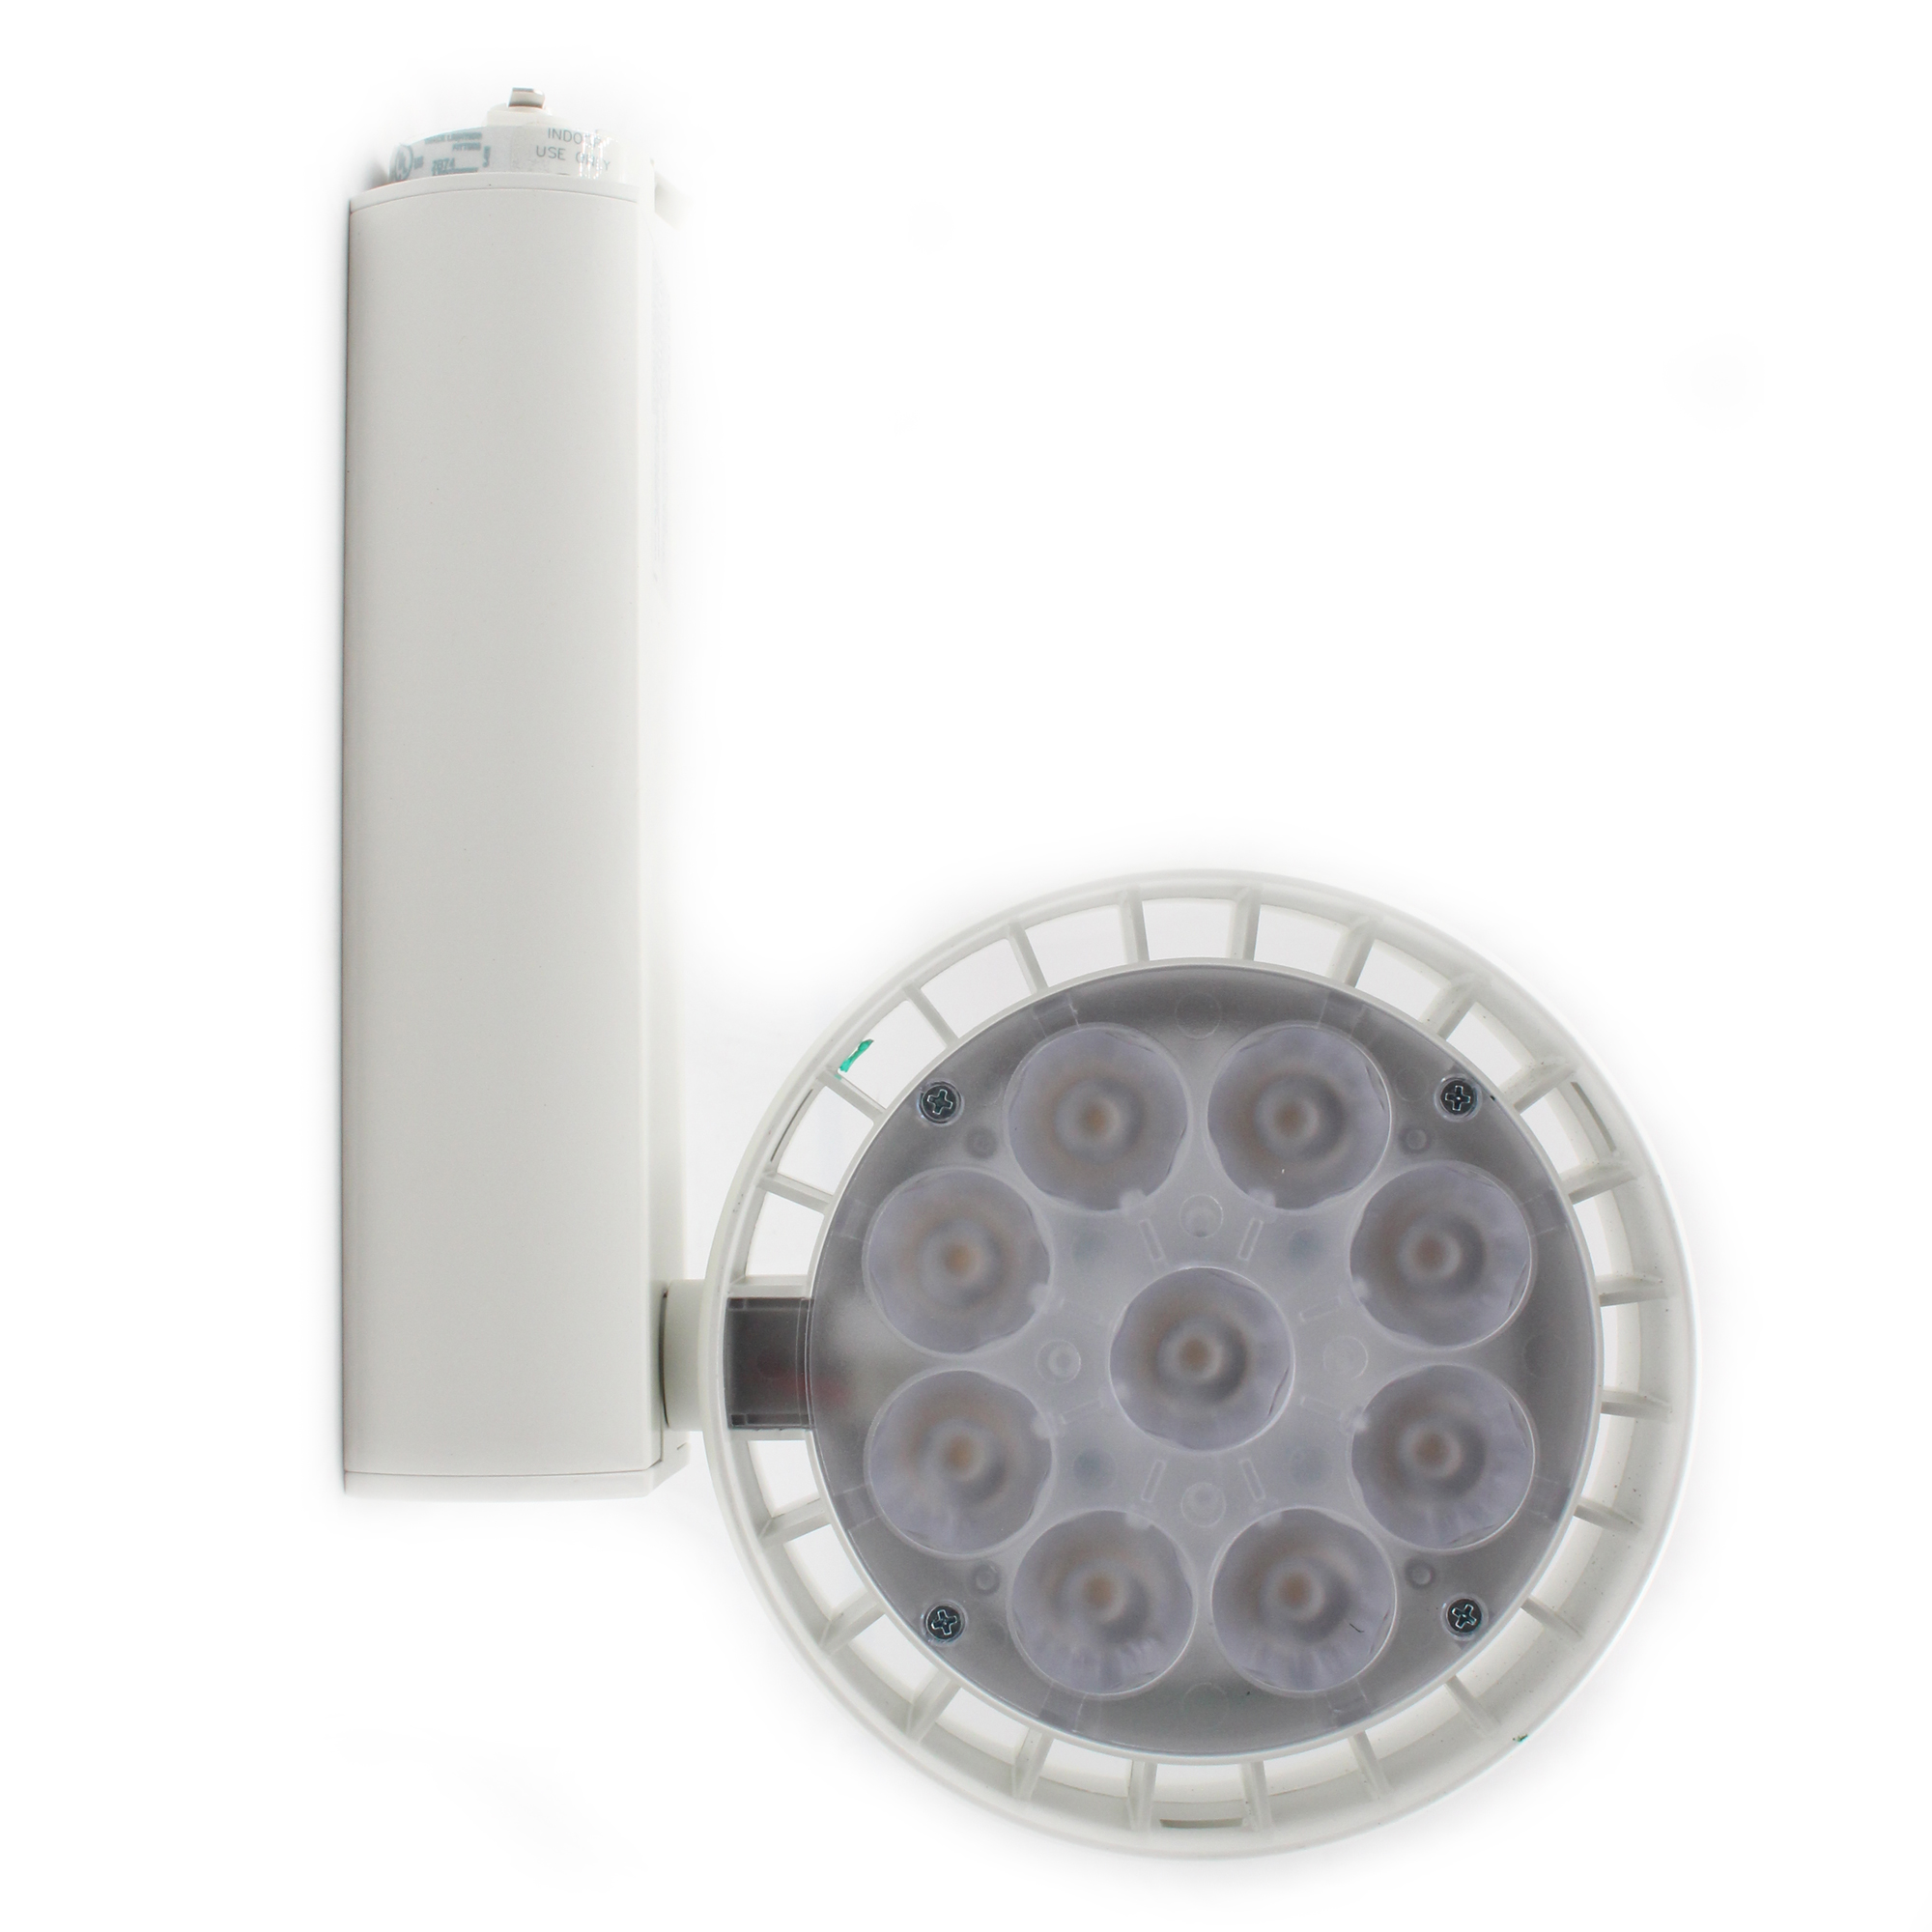 Philips Lightolier Llab130rnfwhva Lytespan Track Lighting